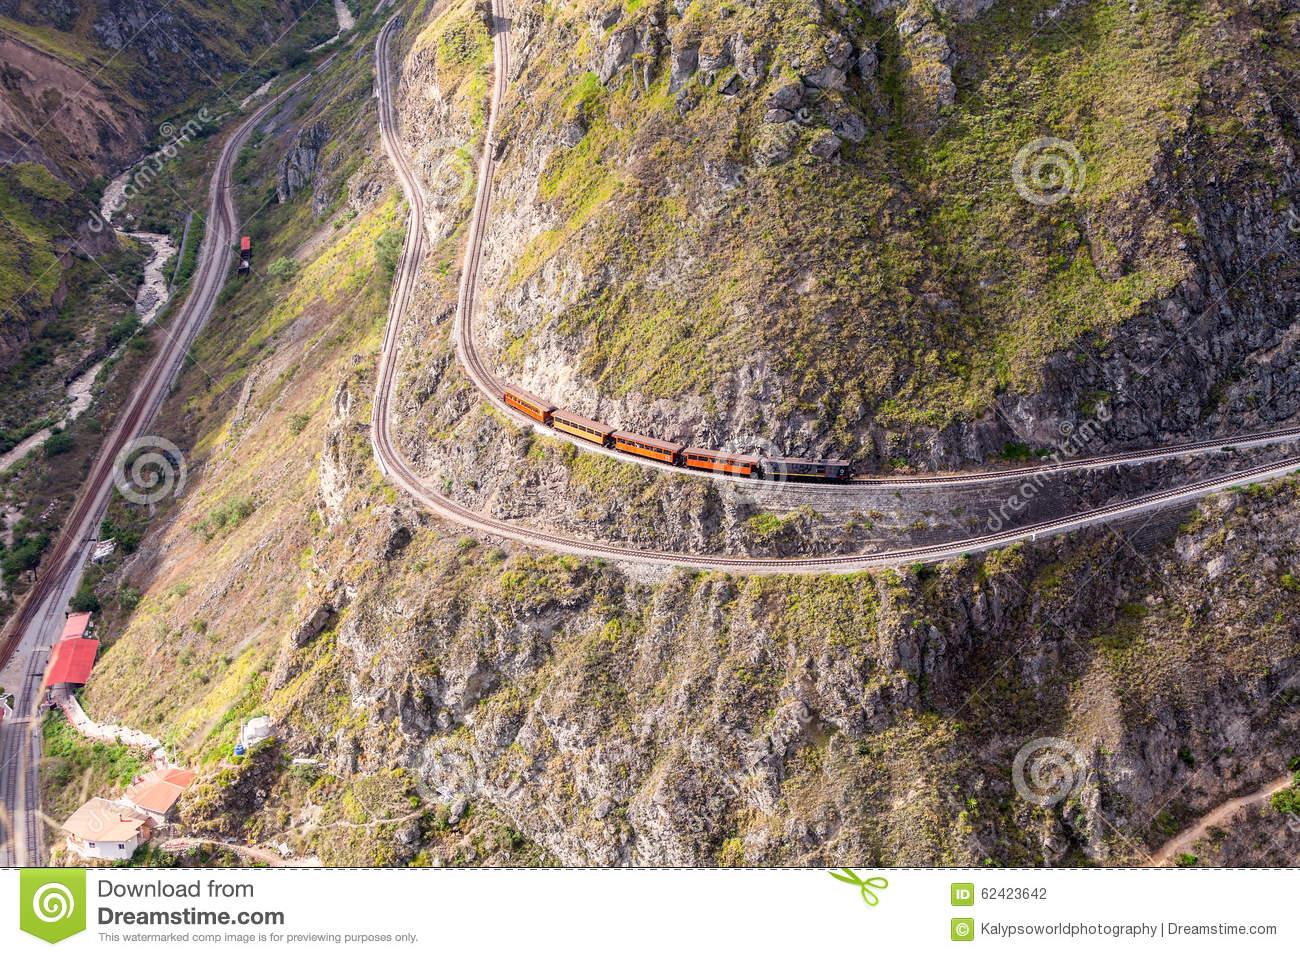 Andean railway clipart #14